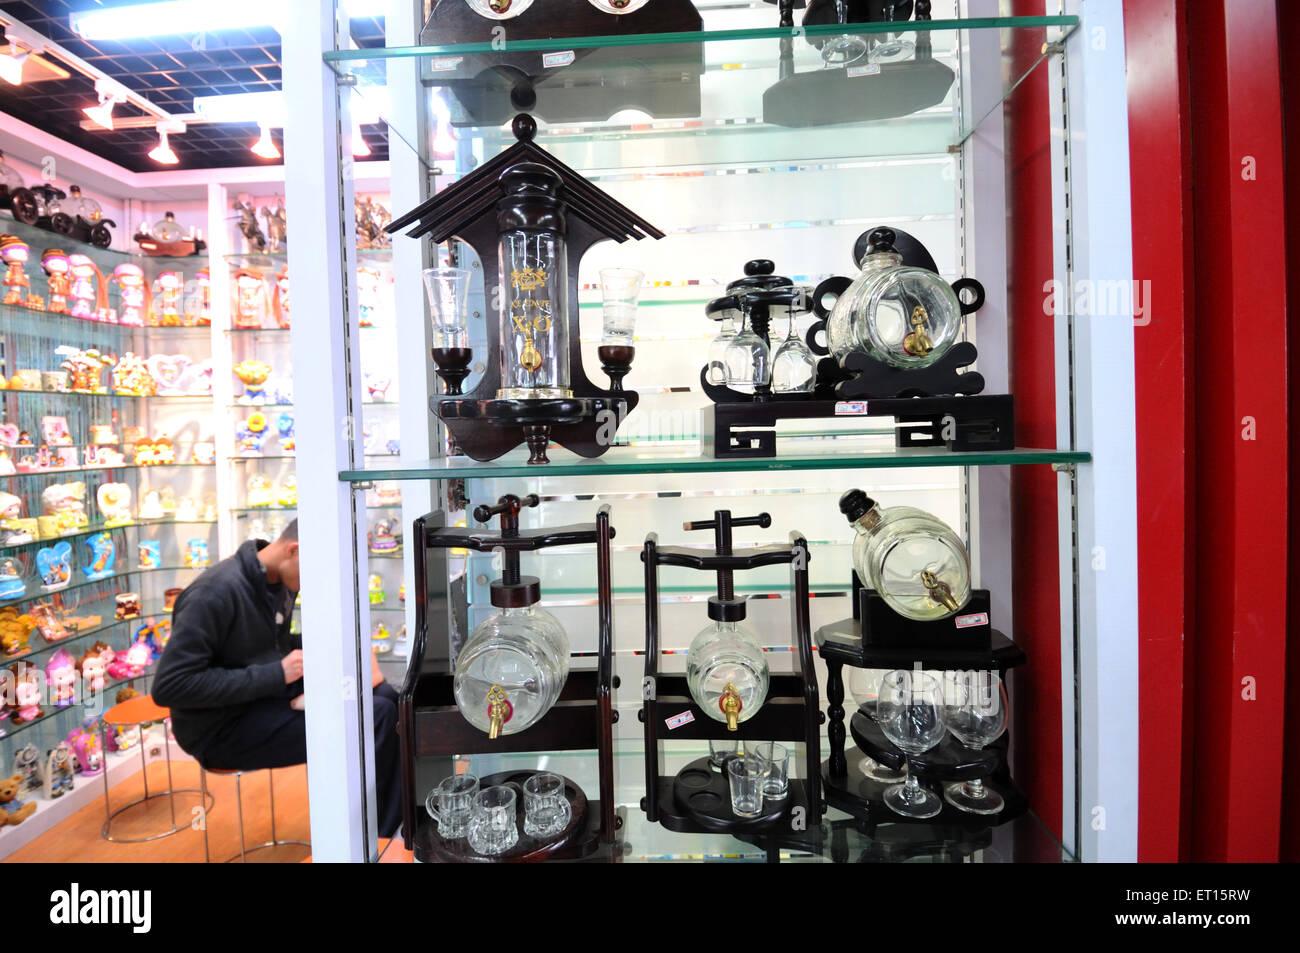 Window display in chinese shop ; Yiwu ; China - Stock Image